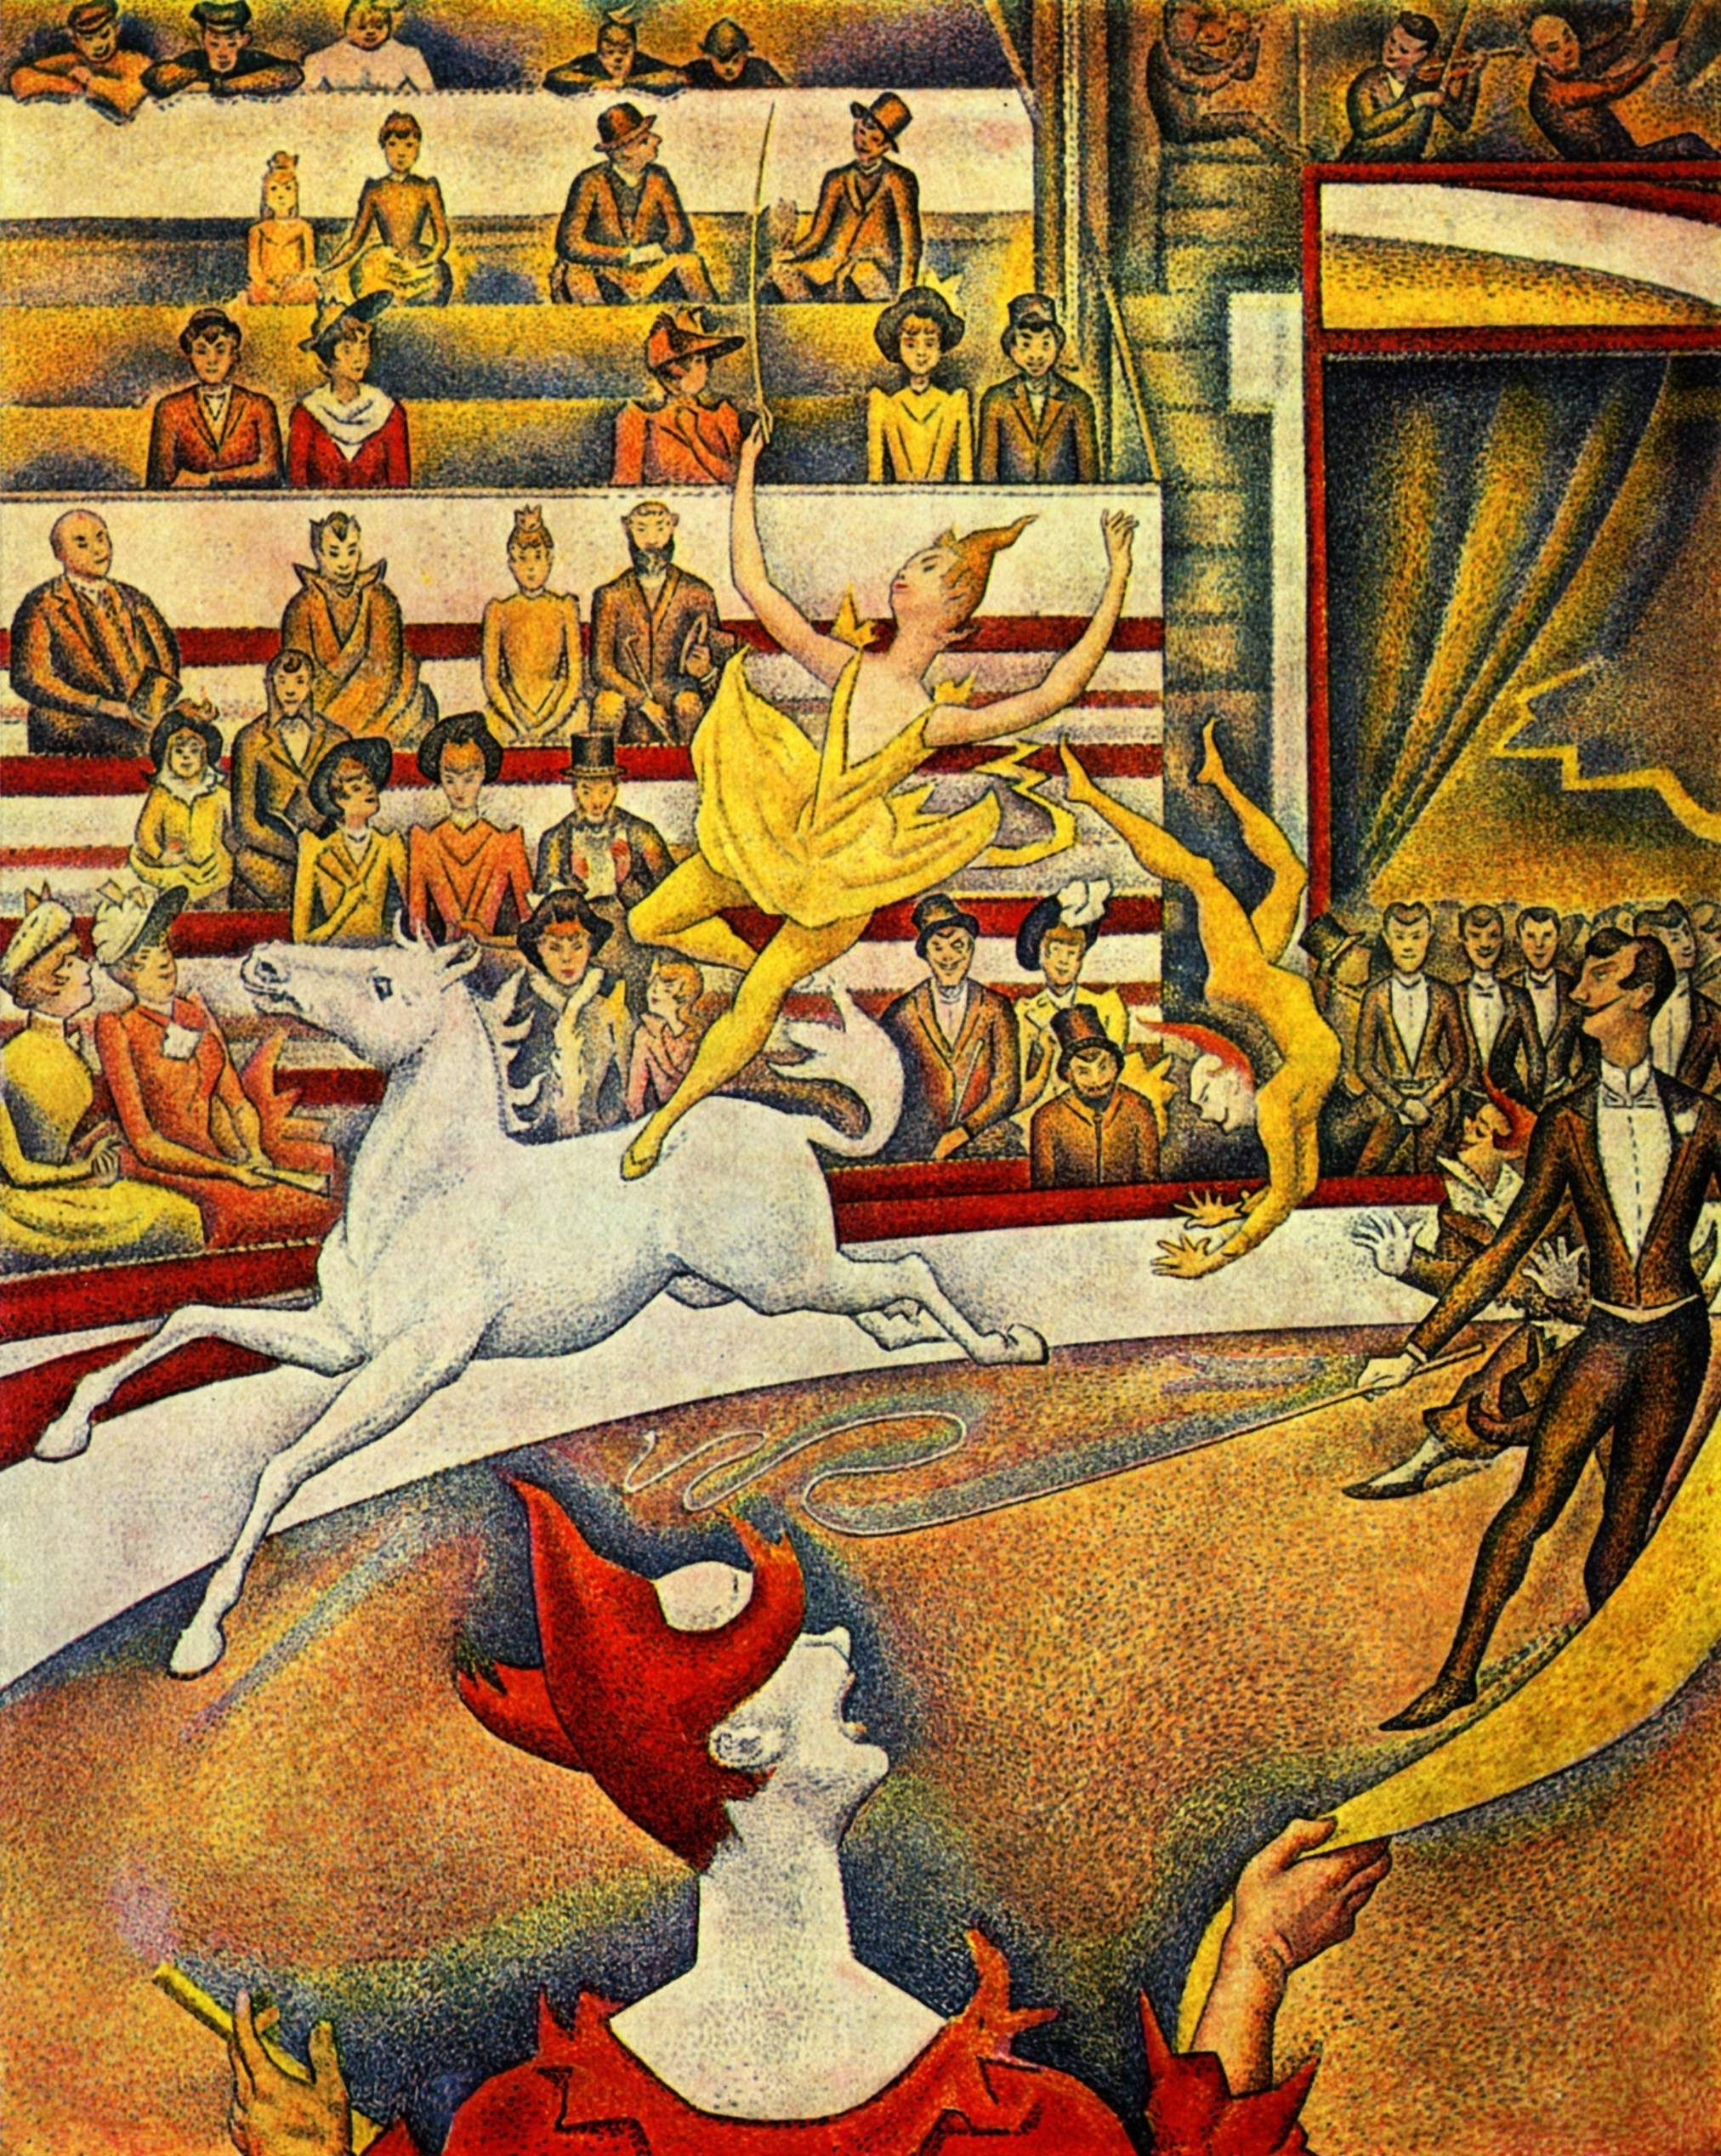 Figura 6. Georges Seurat, Le Cirque